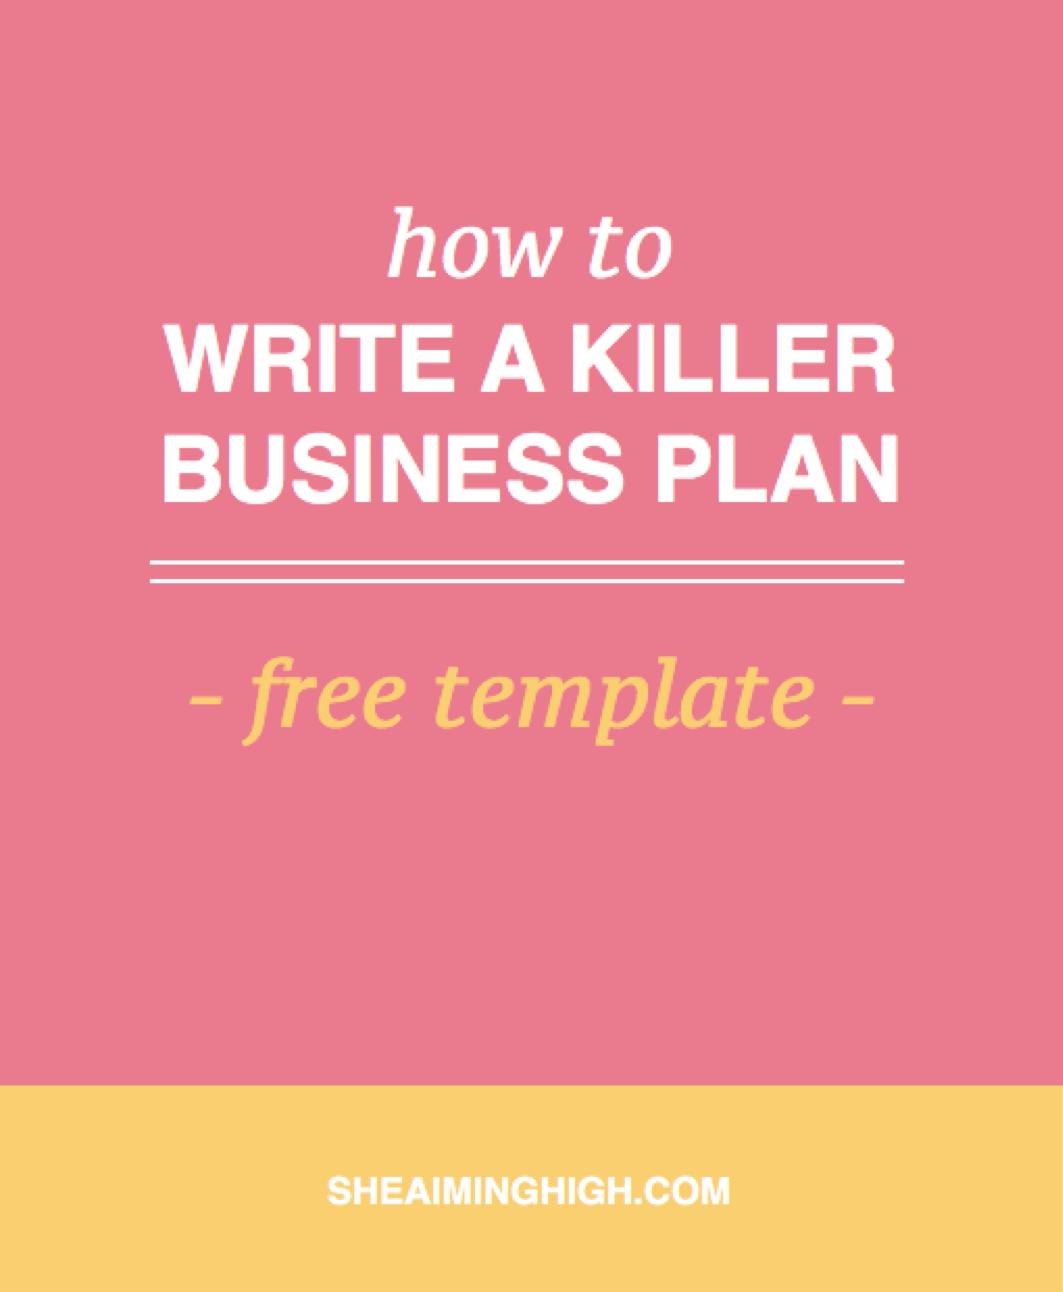 Help writing up a business plan